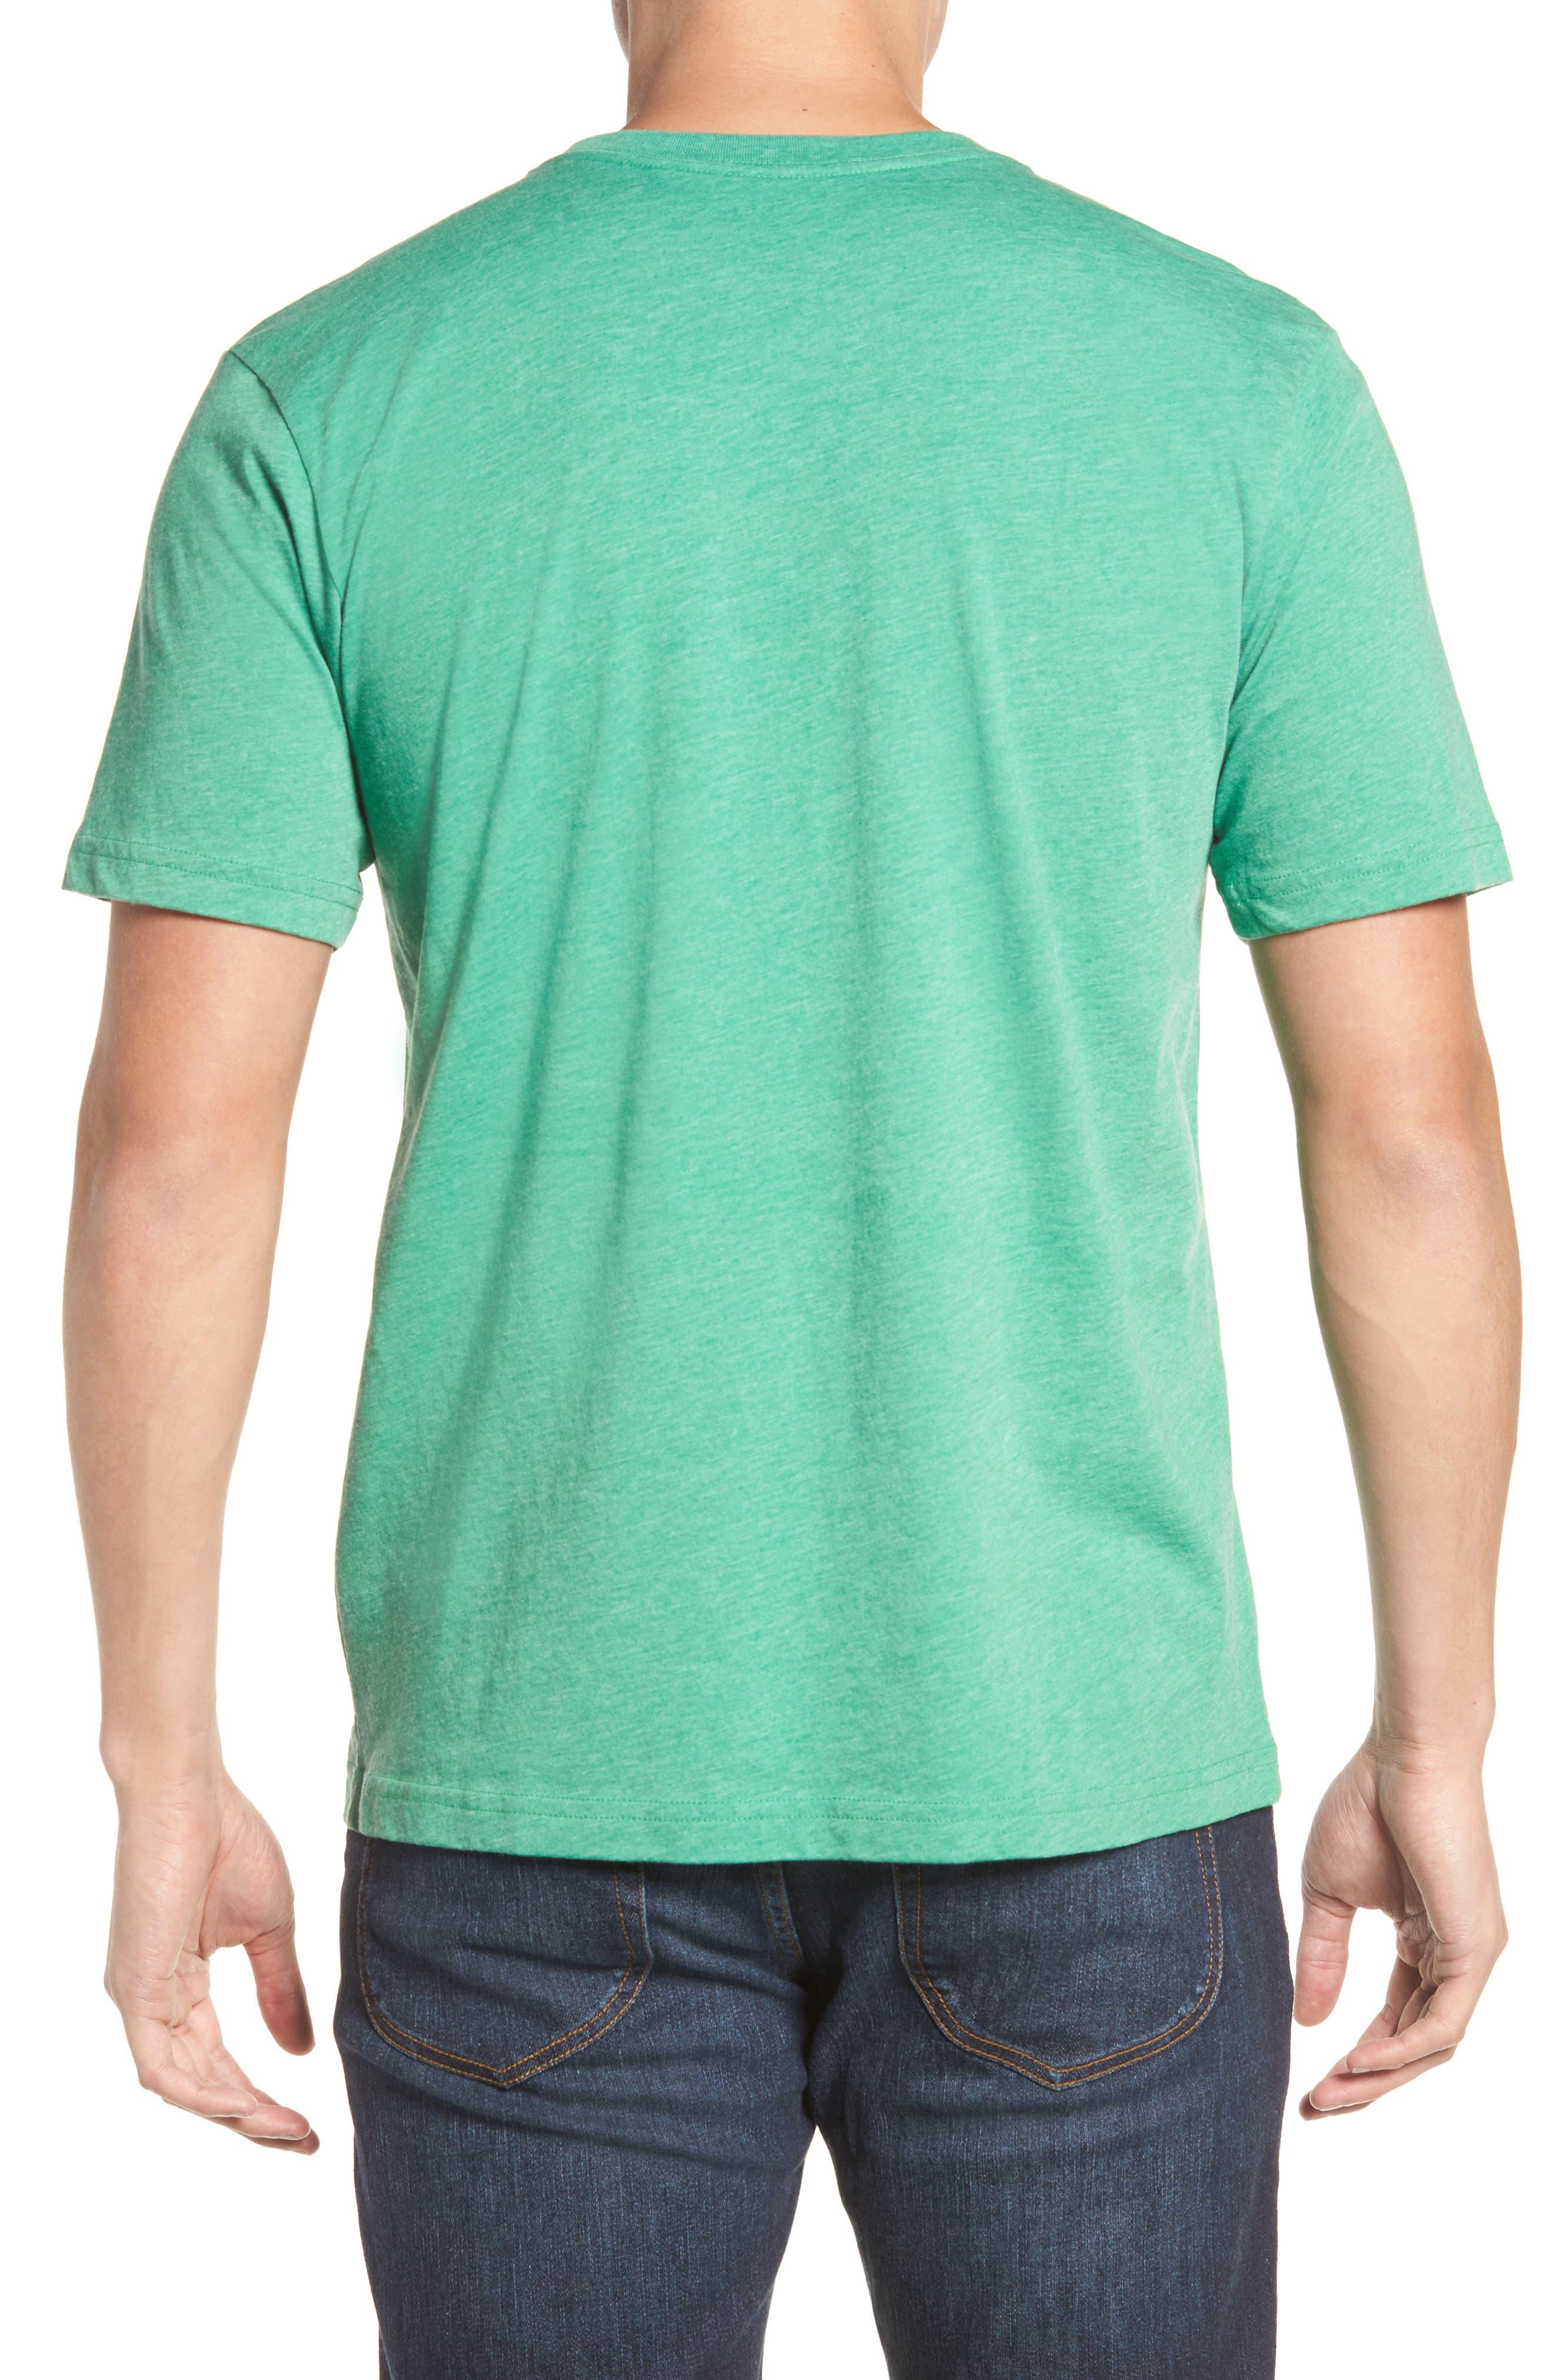 Jason T-Shirt,                             Alternate thumbnail 2, color,                             Heather Green